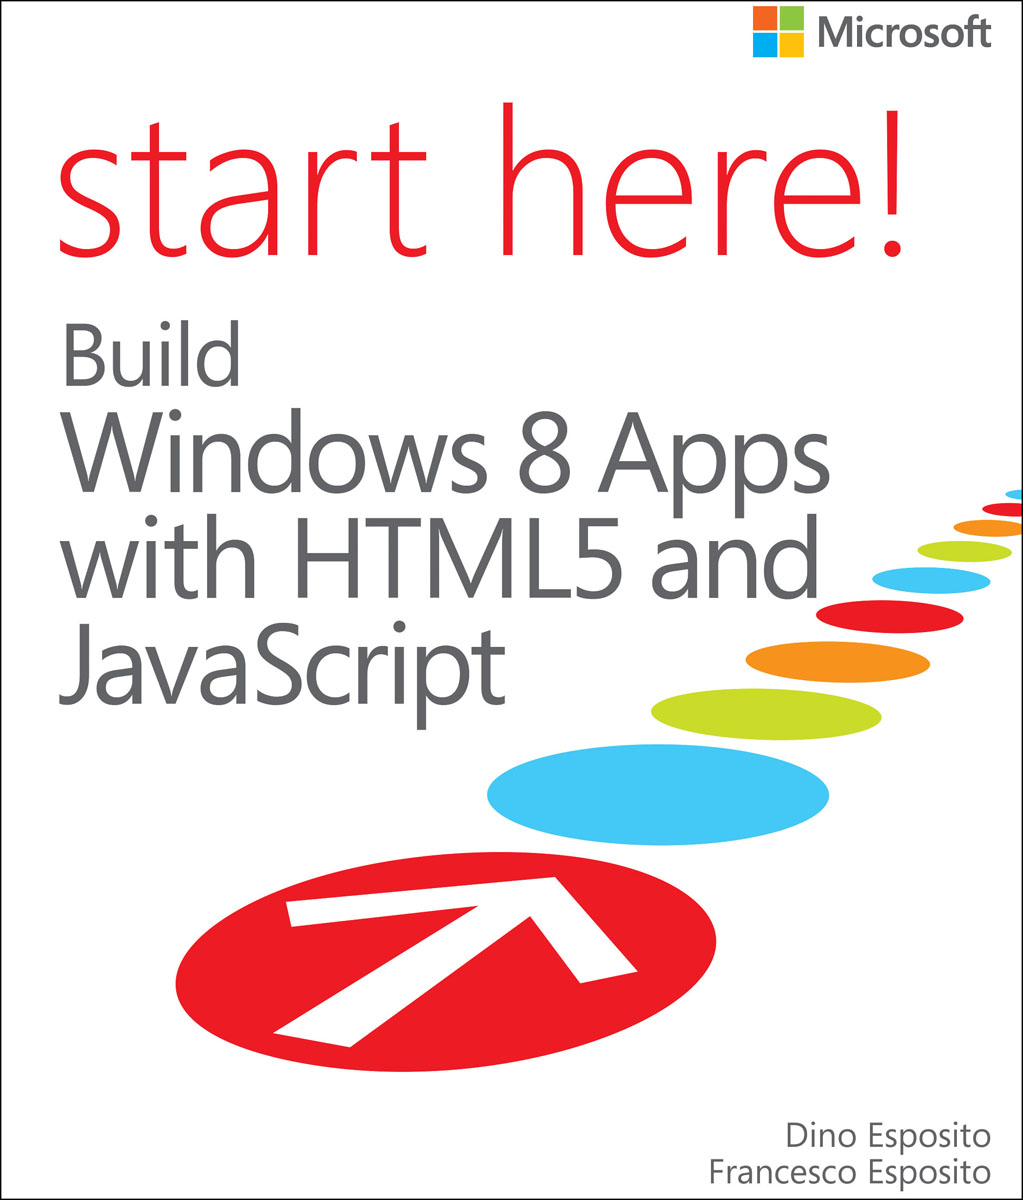 Start Here! Build Windows 8 Apps with HTML5 and JavaScript разработка приложений для windows 8 на html5 и javascript